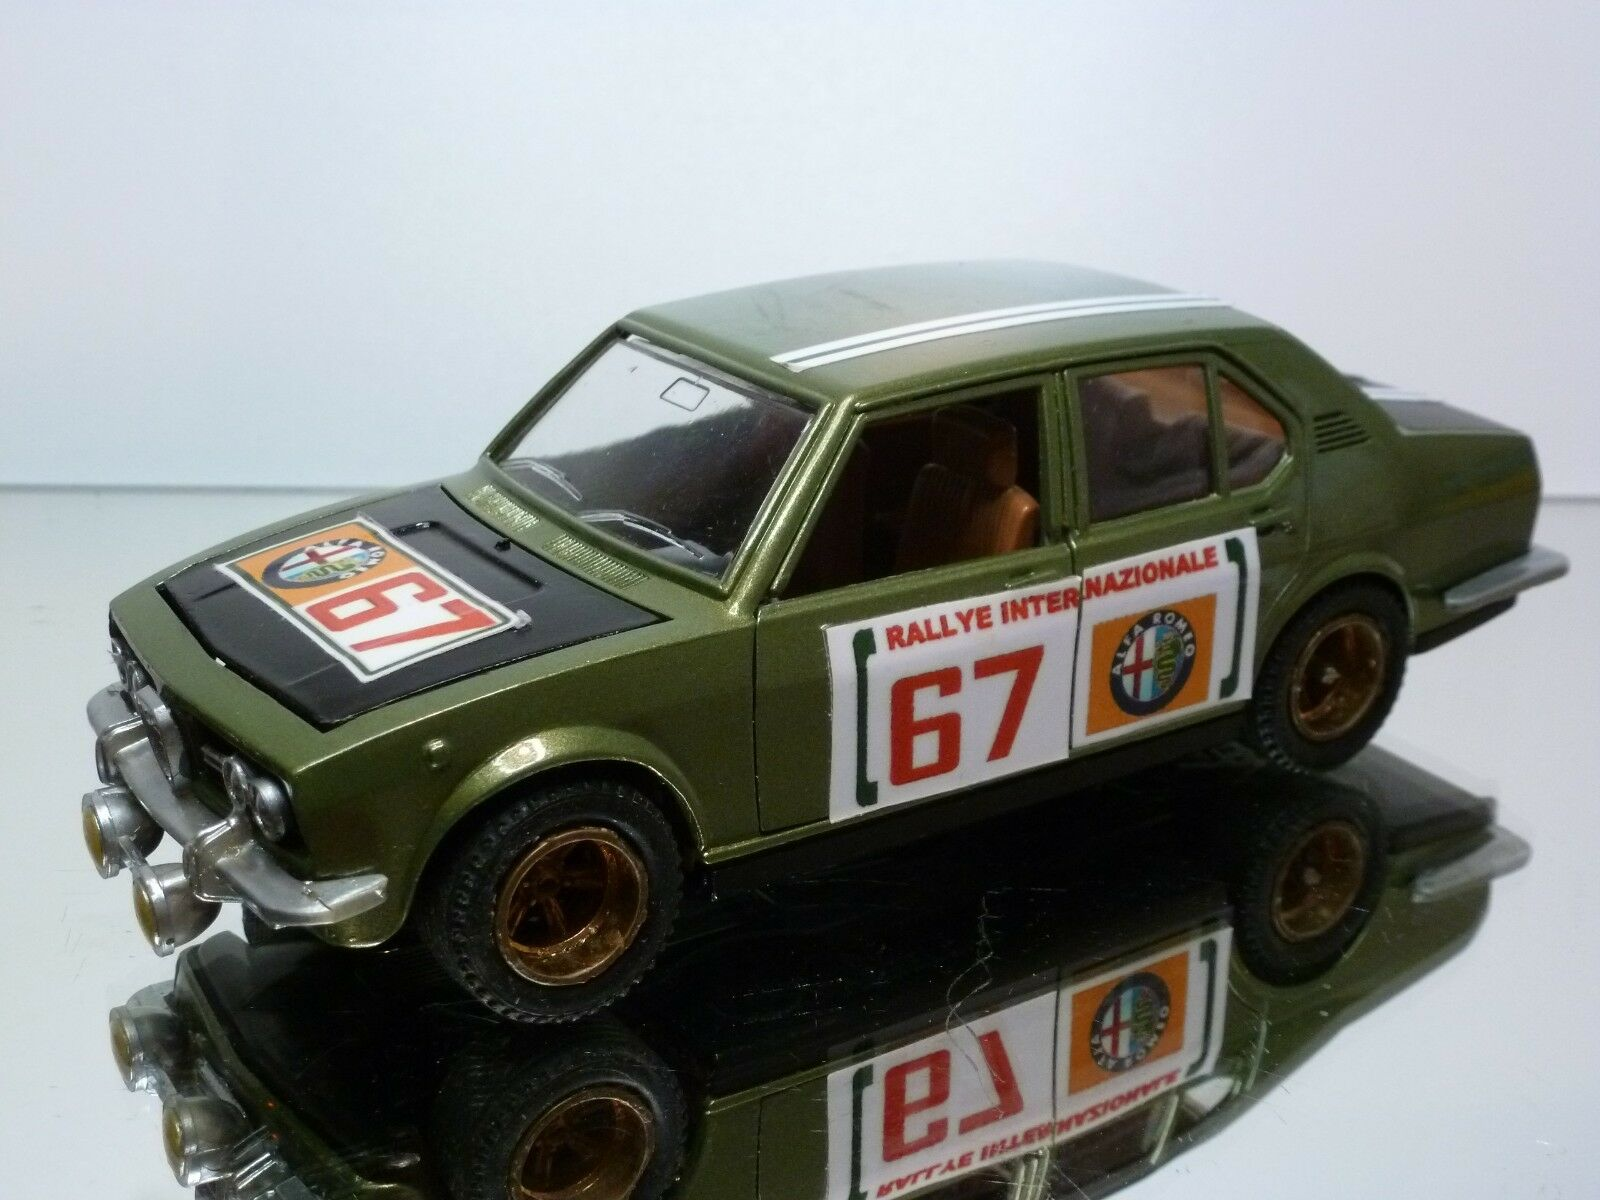 Mebetoys alfa romeo alfetta rallye   67 - grüne 1  25 - gut - restauriert.